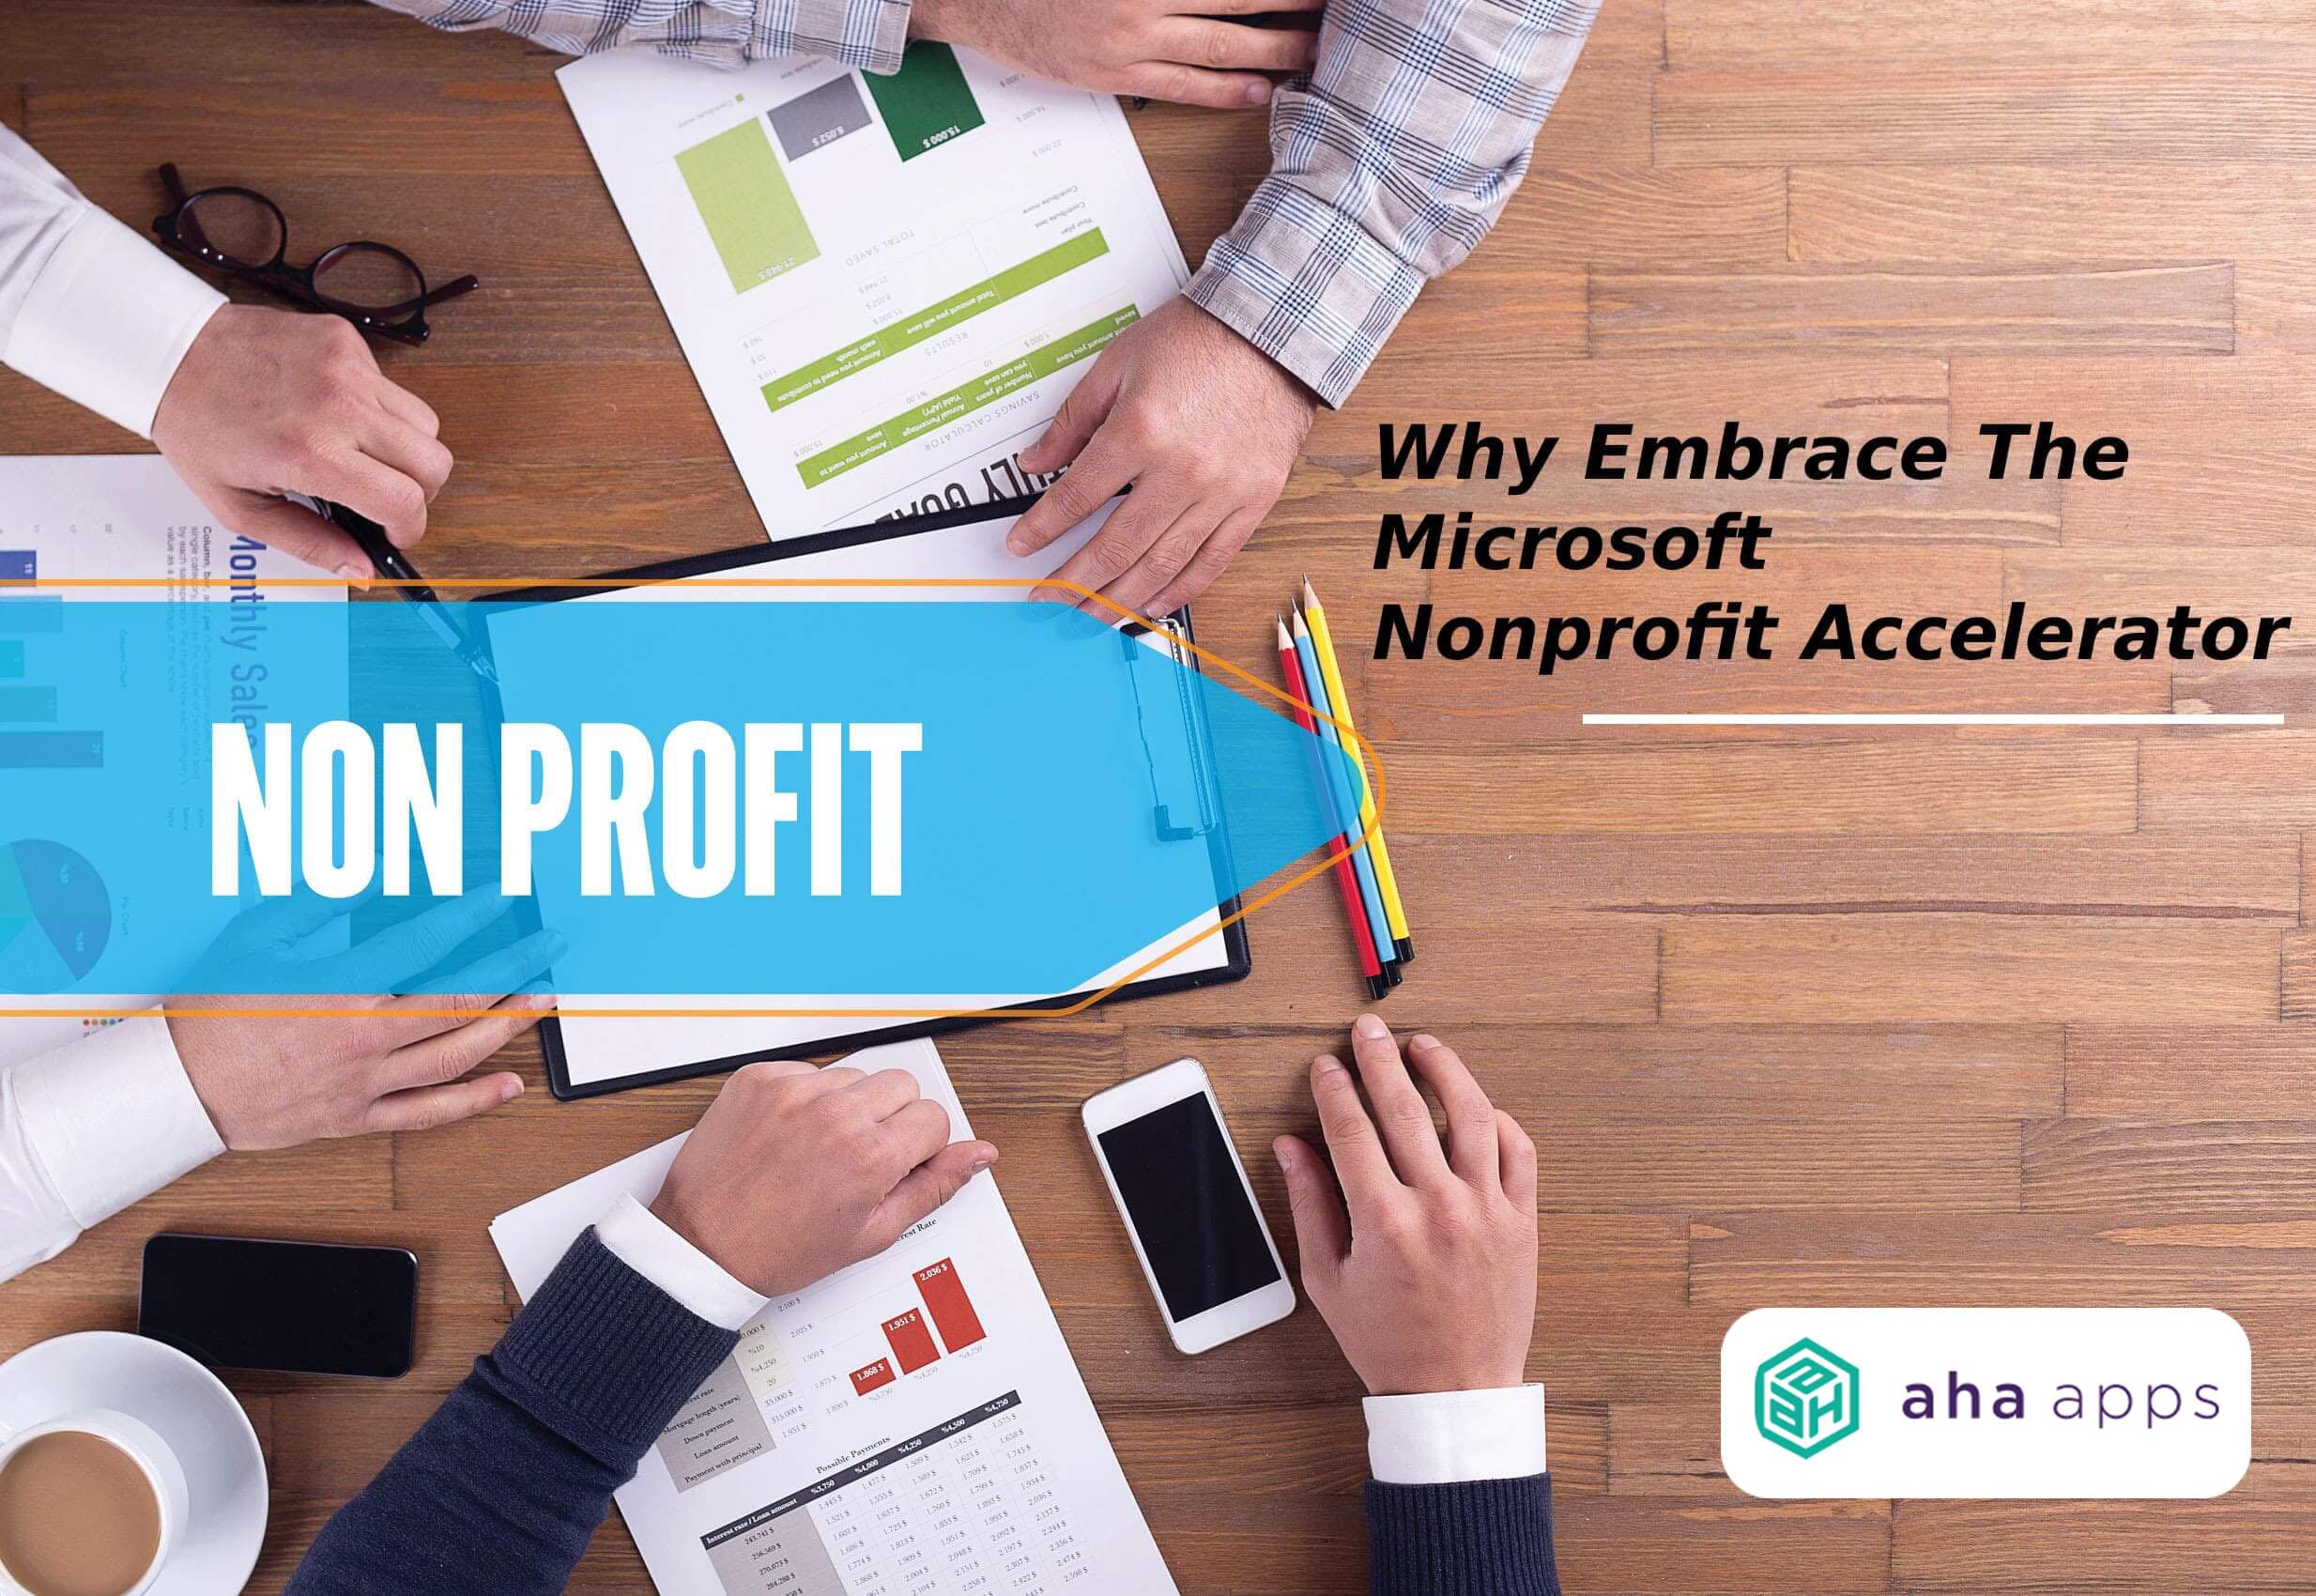 Microsoft Nonprofit Accelerator